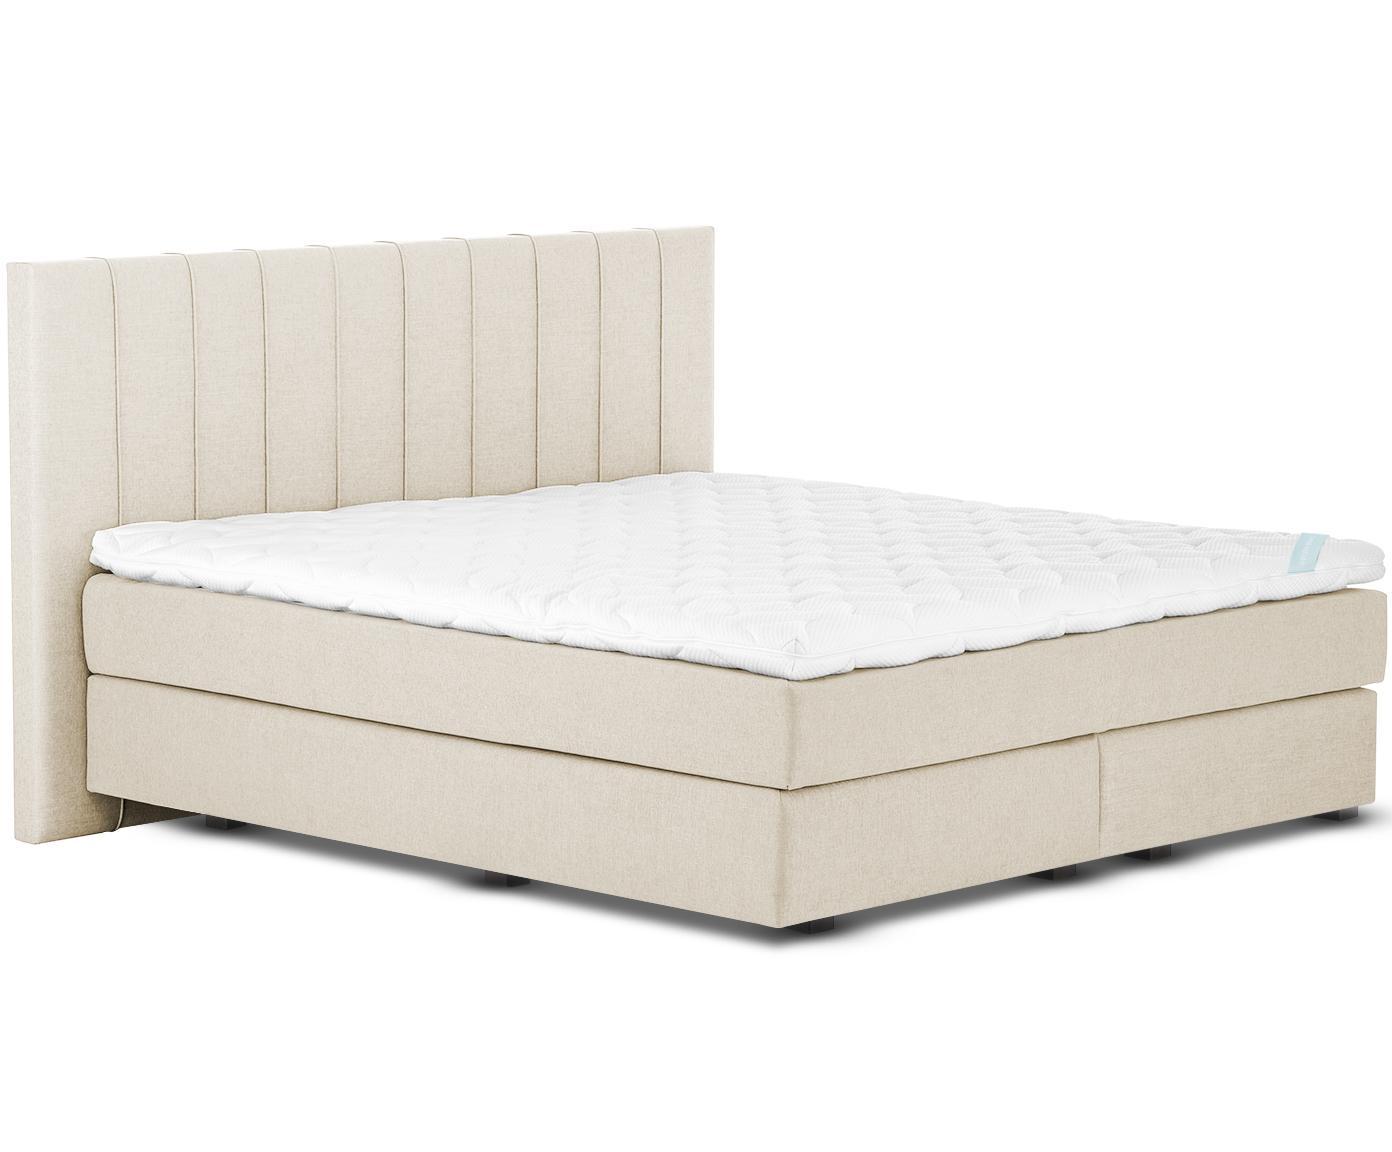 Premium boxspring bed Lacey, Matras: 7-zones-pocketveringkern , Poten: massief gelakt beukenhout, Beige, 180 x 200 cm